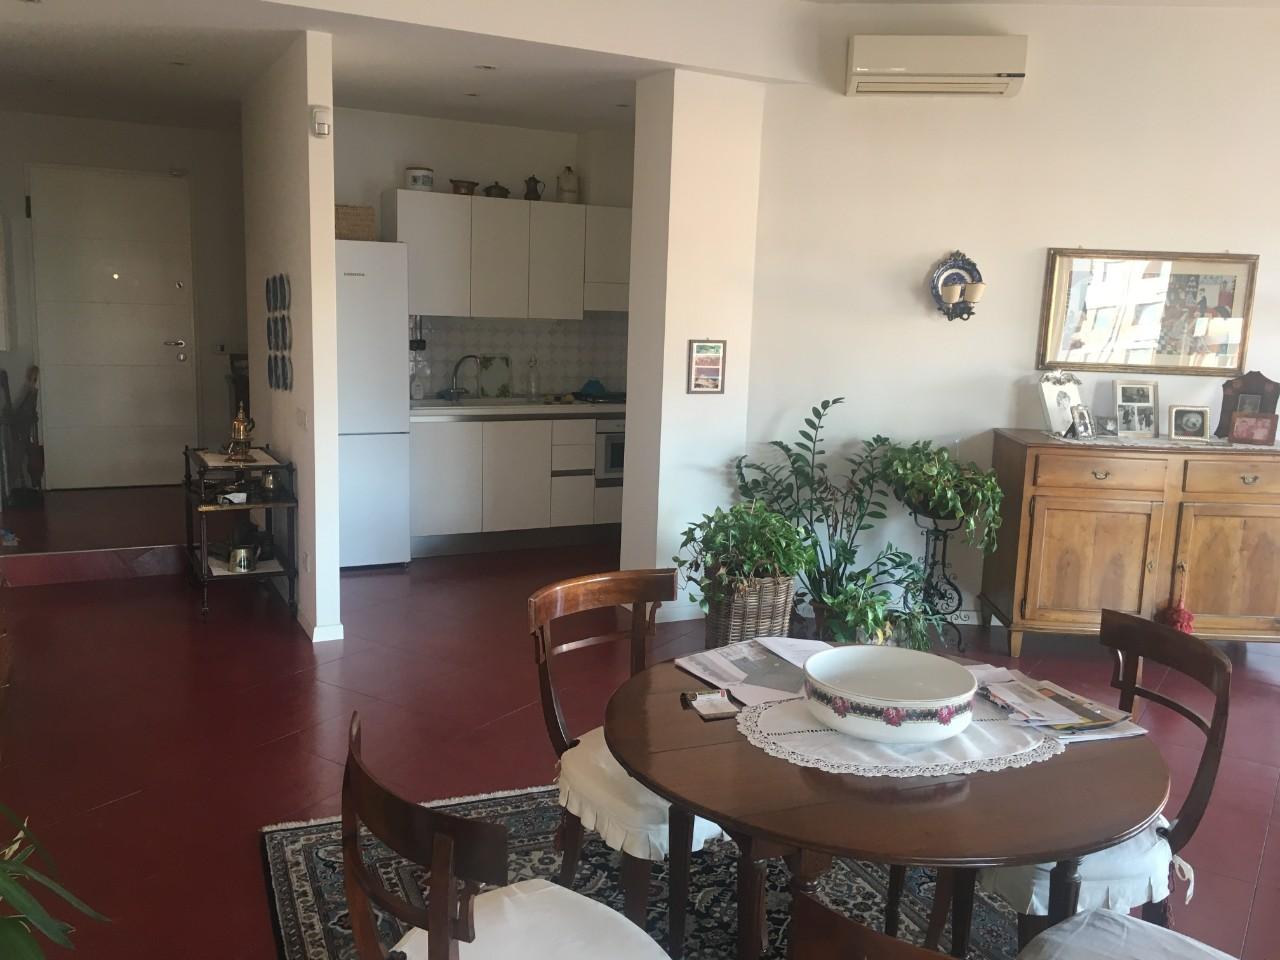 bologna vendita quart: san felice anteprima immobiliare srls